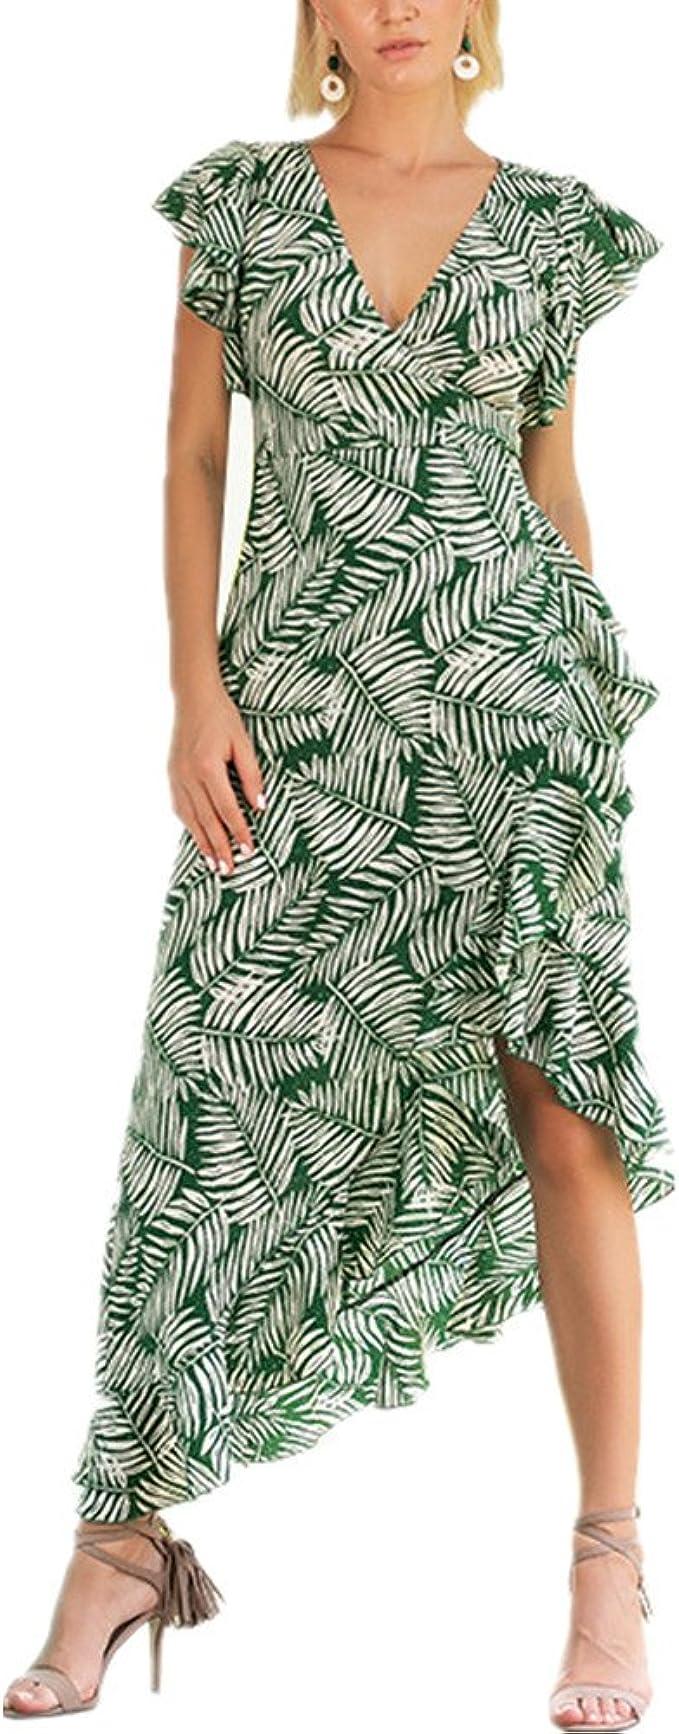 Dotbuy Vintage Kleider Frauen, Grüne Blätter Cocktailkleider